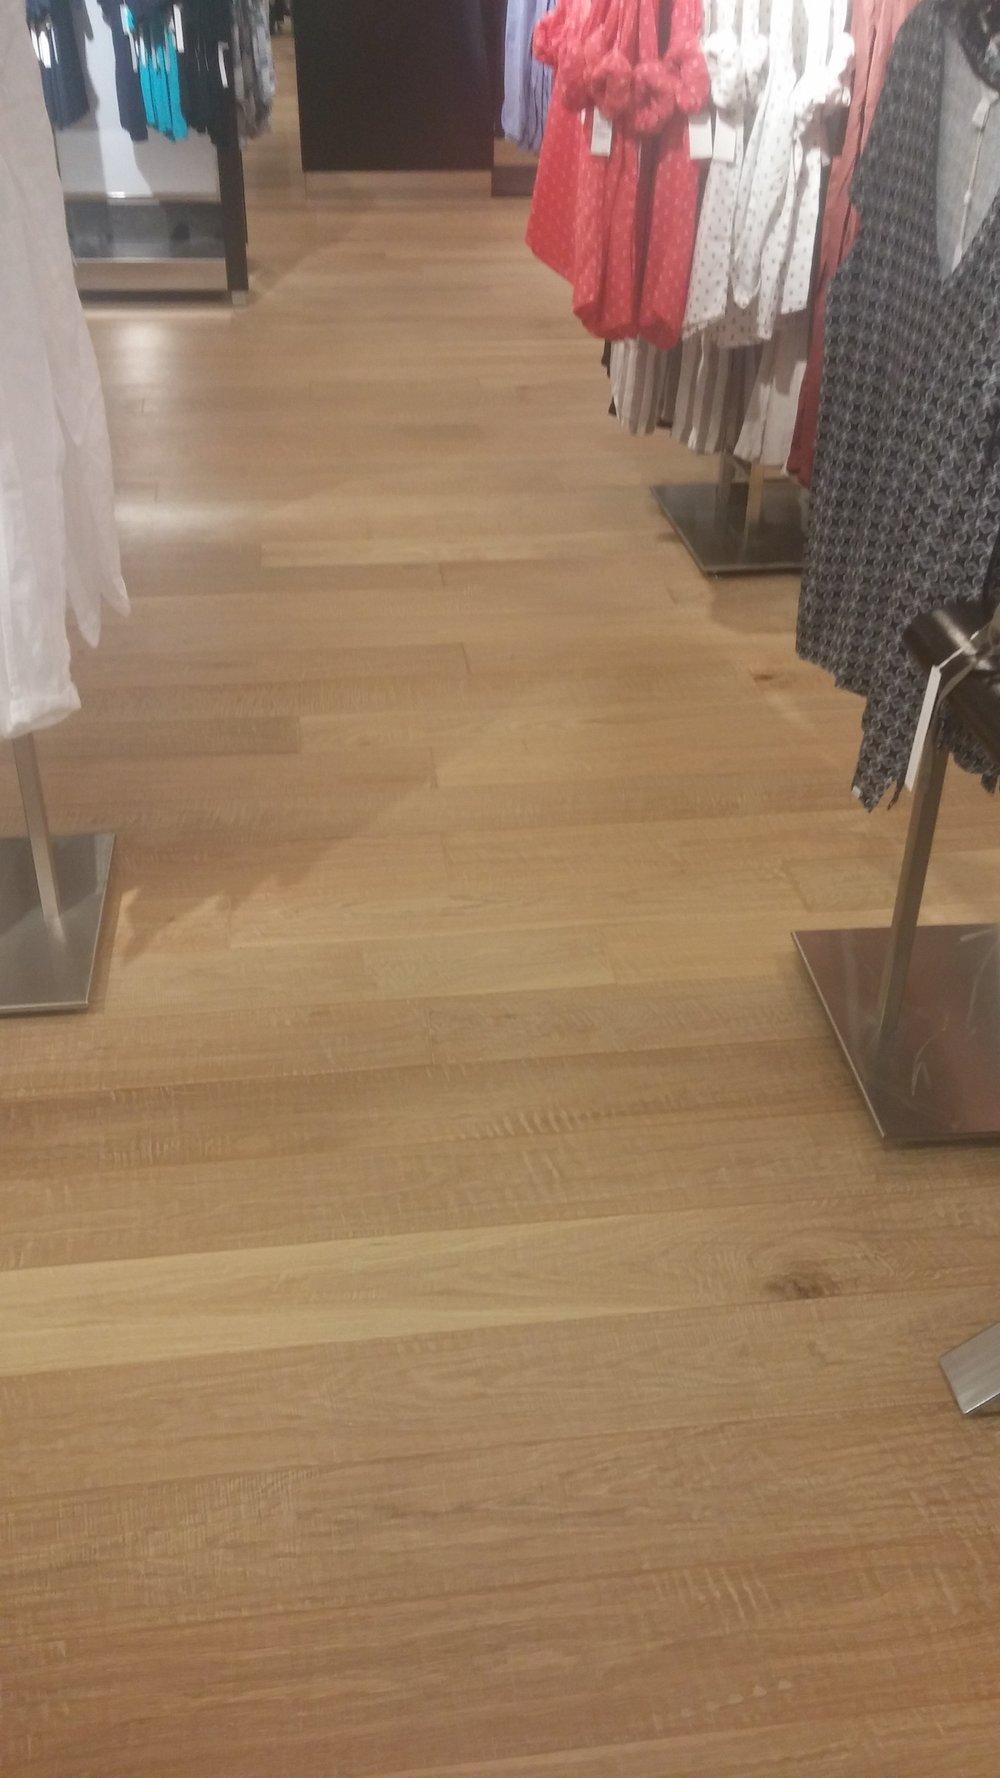 Major Retail-0013.jpg